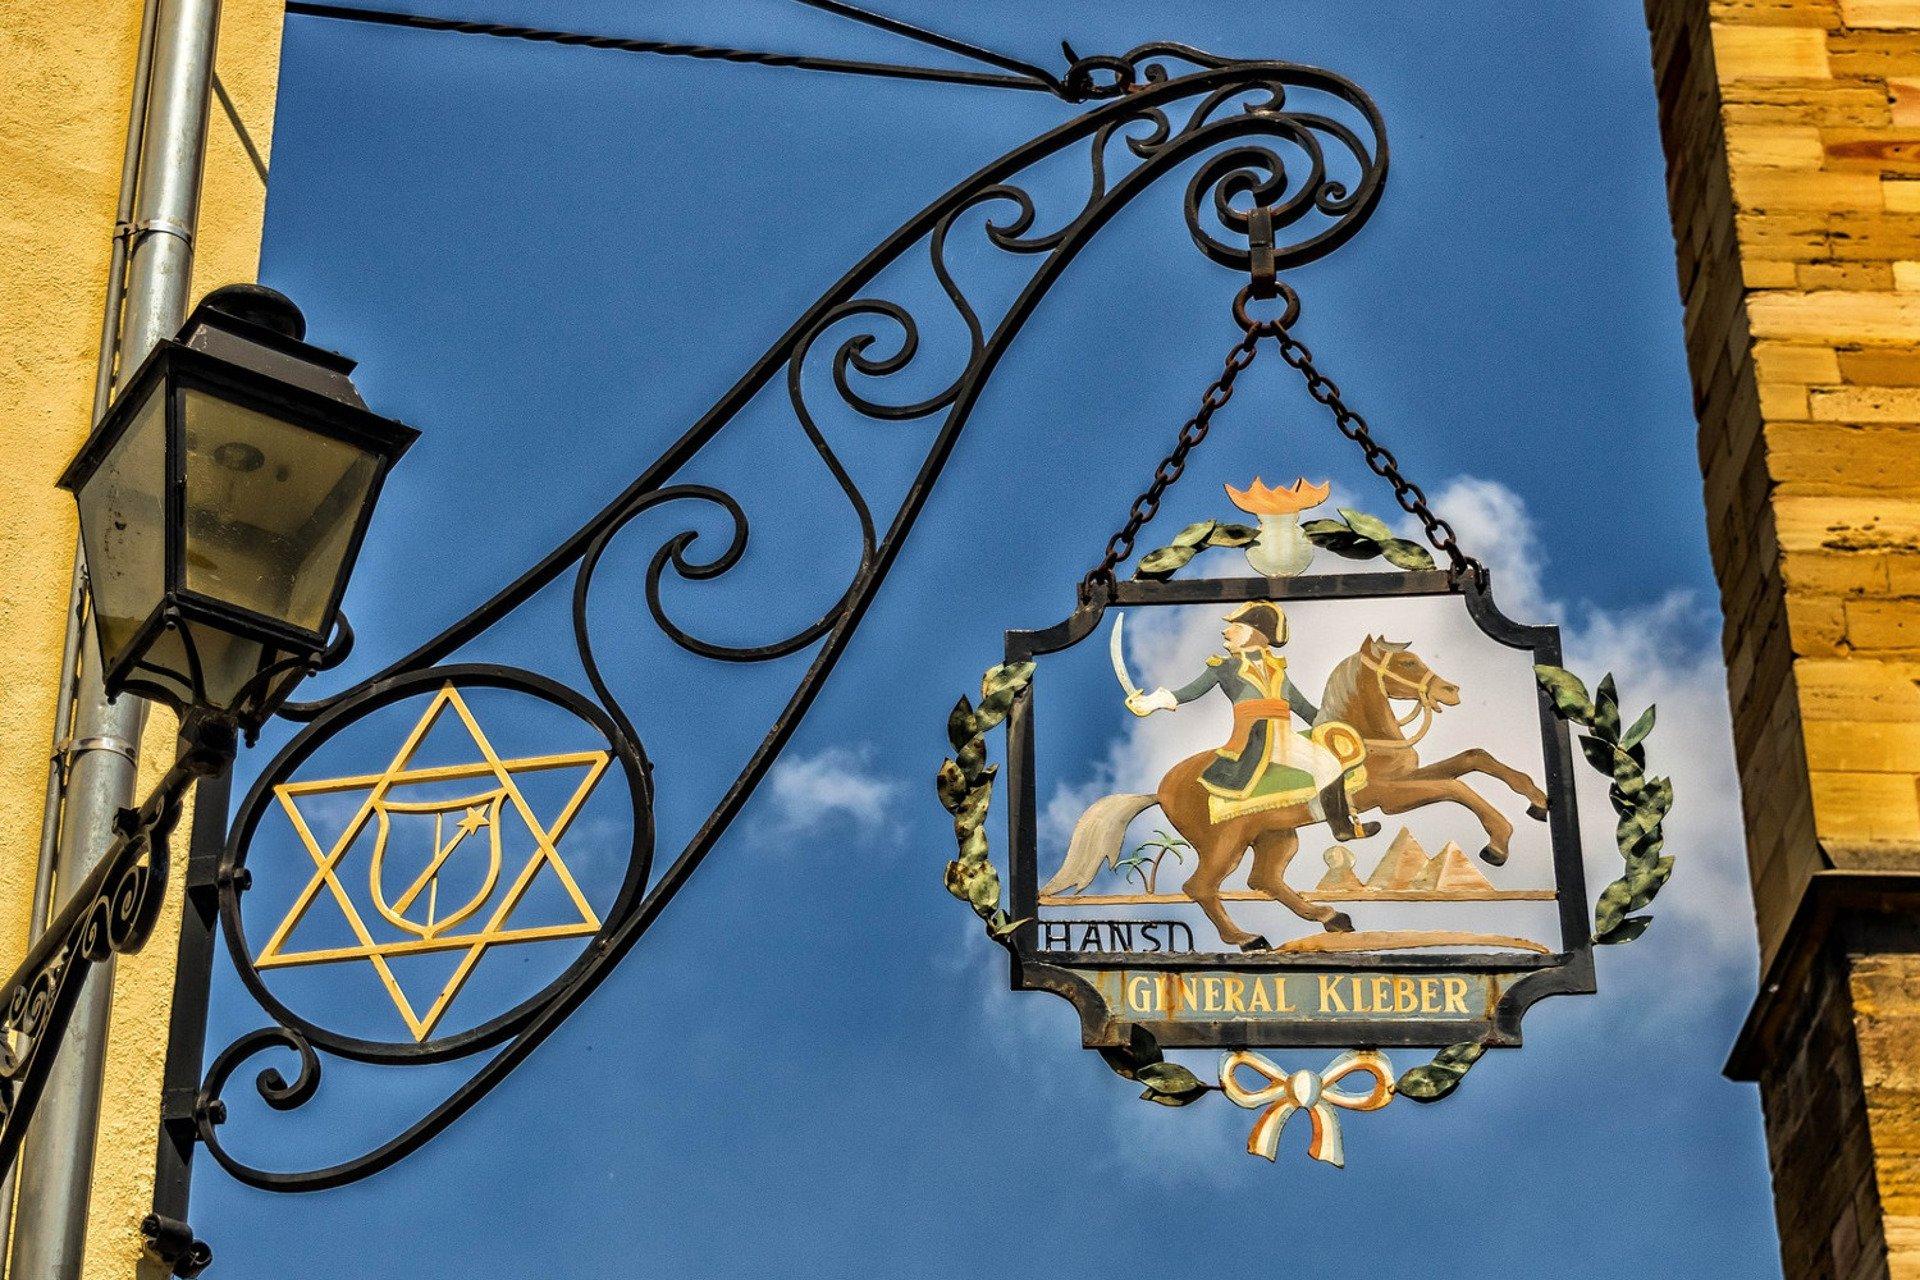 visite privée-enseigne-Colmar-Alsace-France